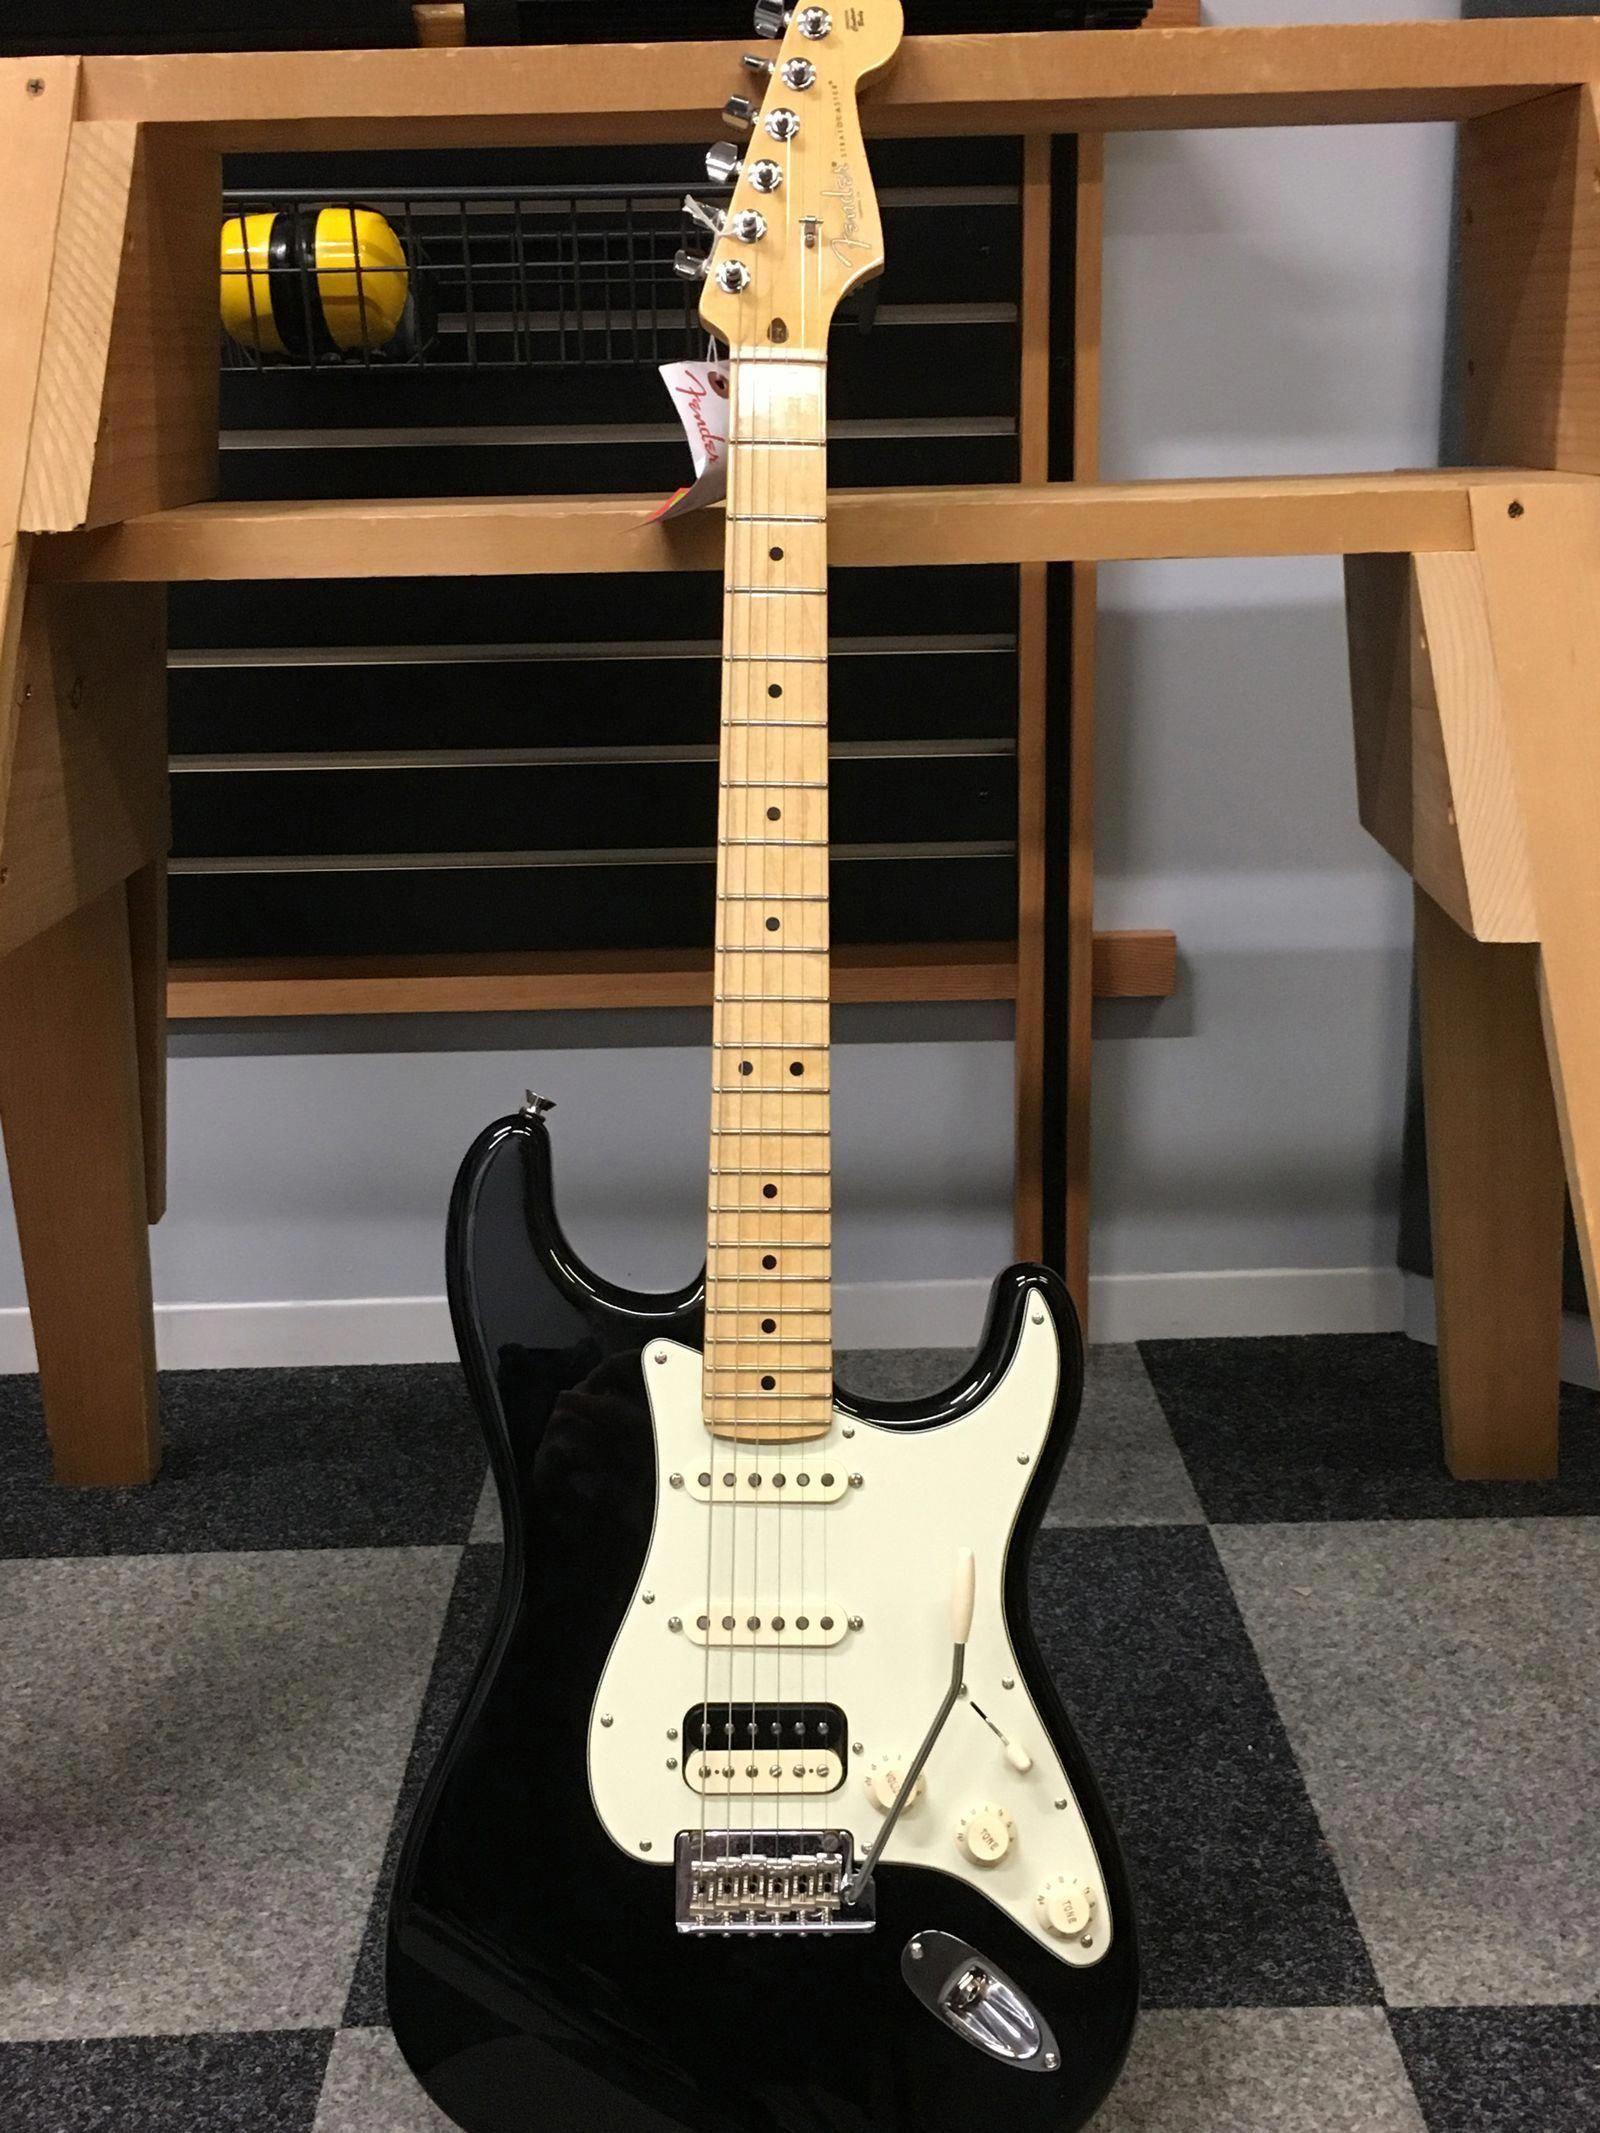 Fender Guitar Eric Clapton Fender Guitar Replacement Parts #guitarplayers #guitarstrings #FenderGuitars #fenderguitars